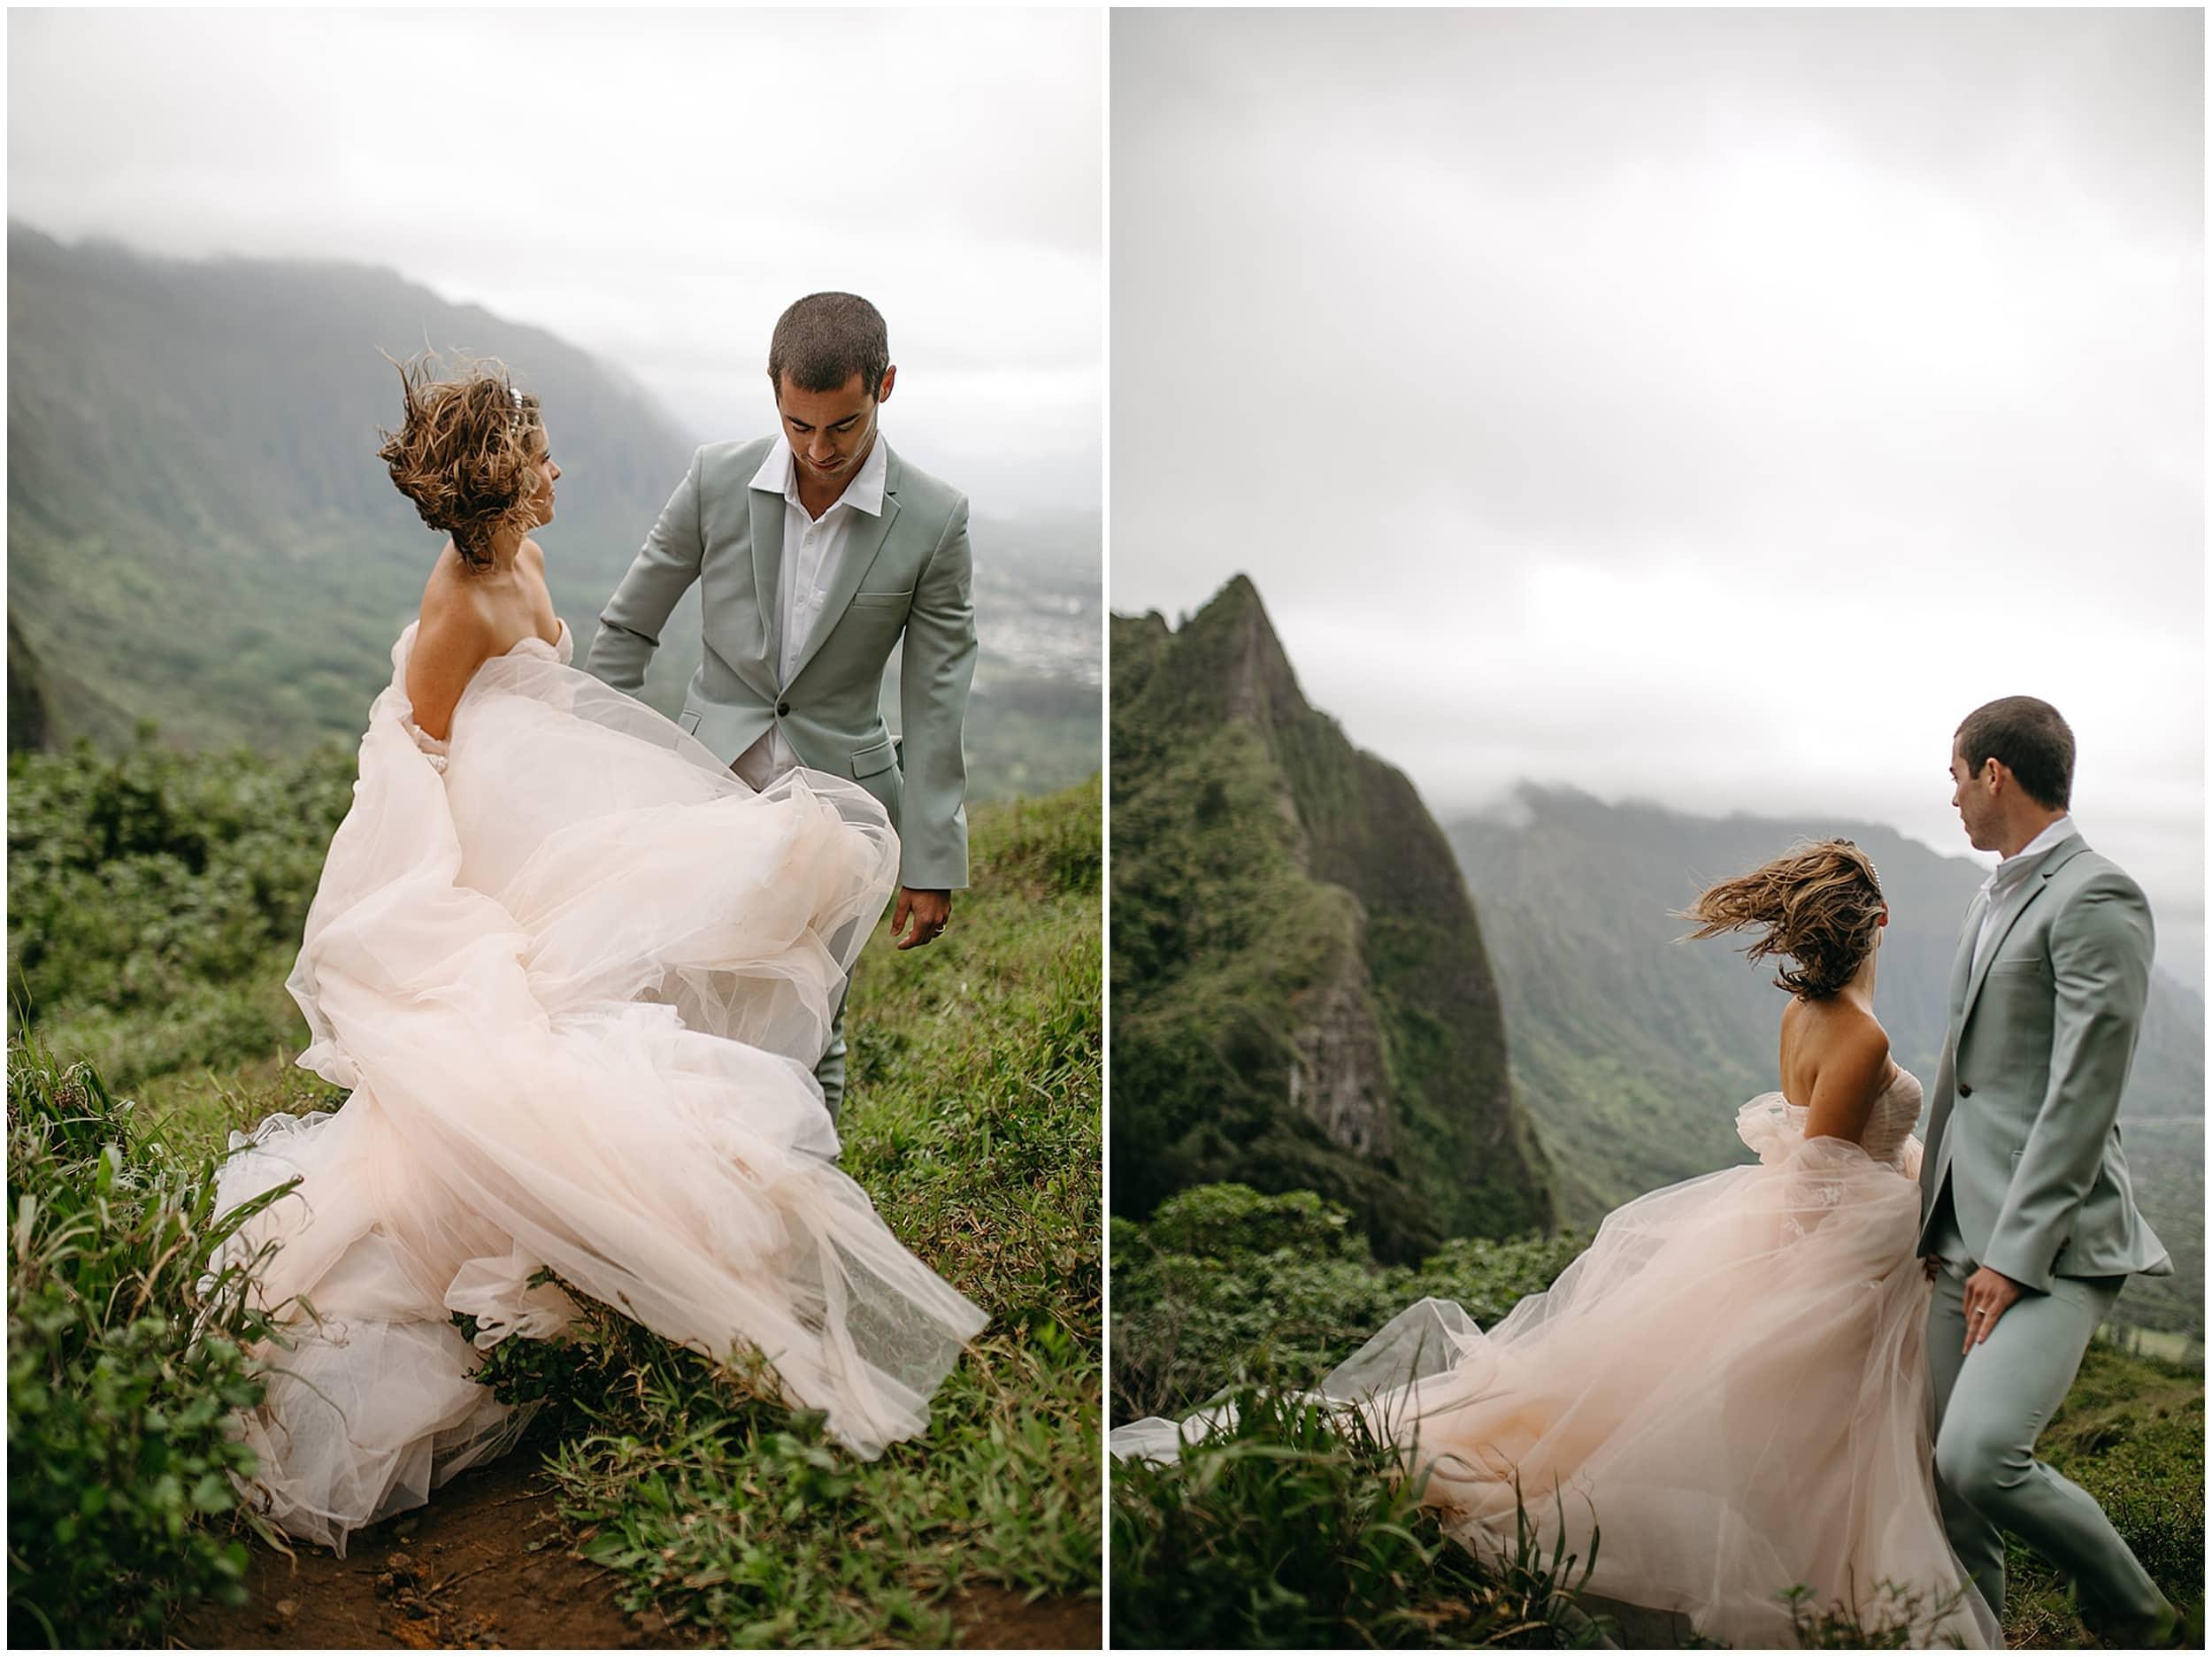 groom leading bride down mountain